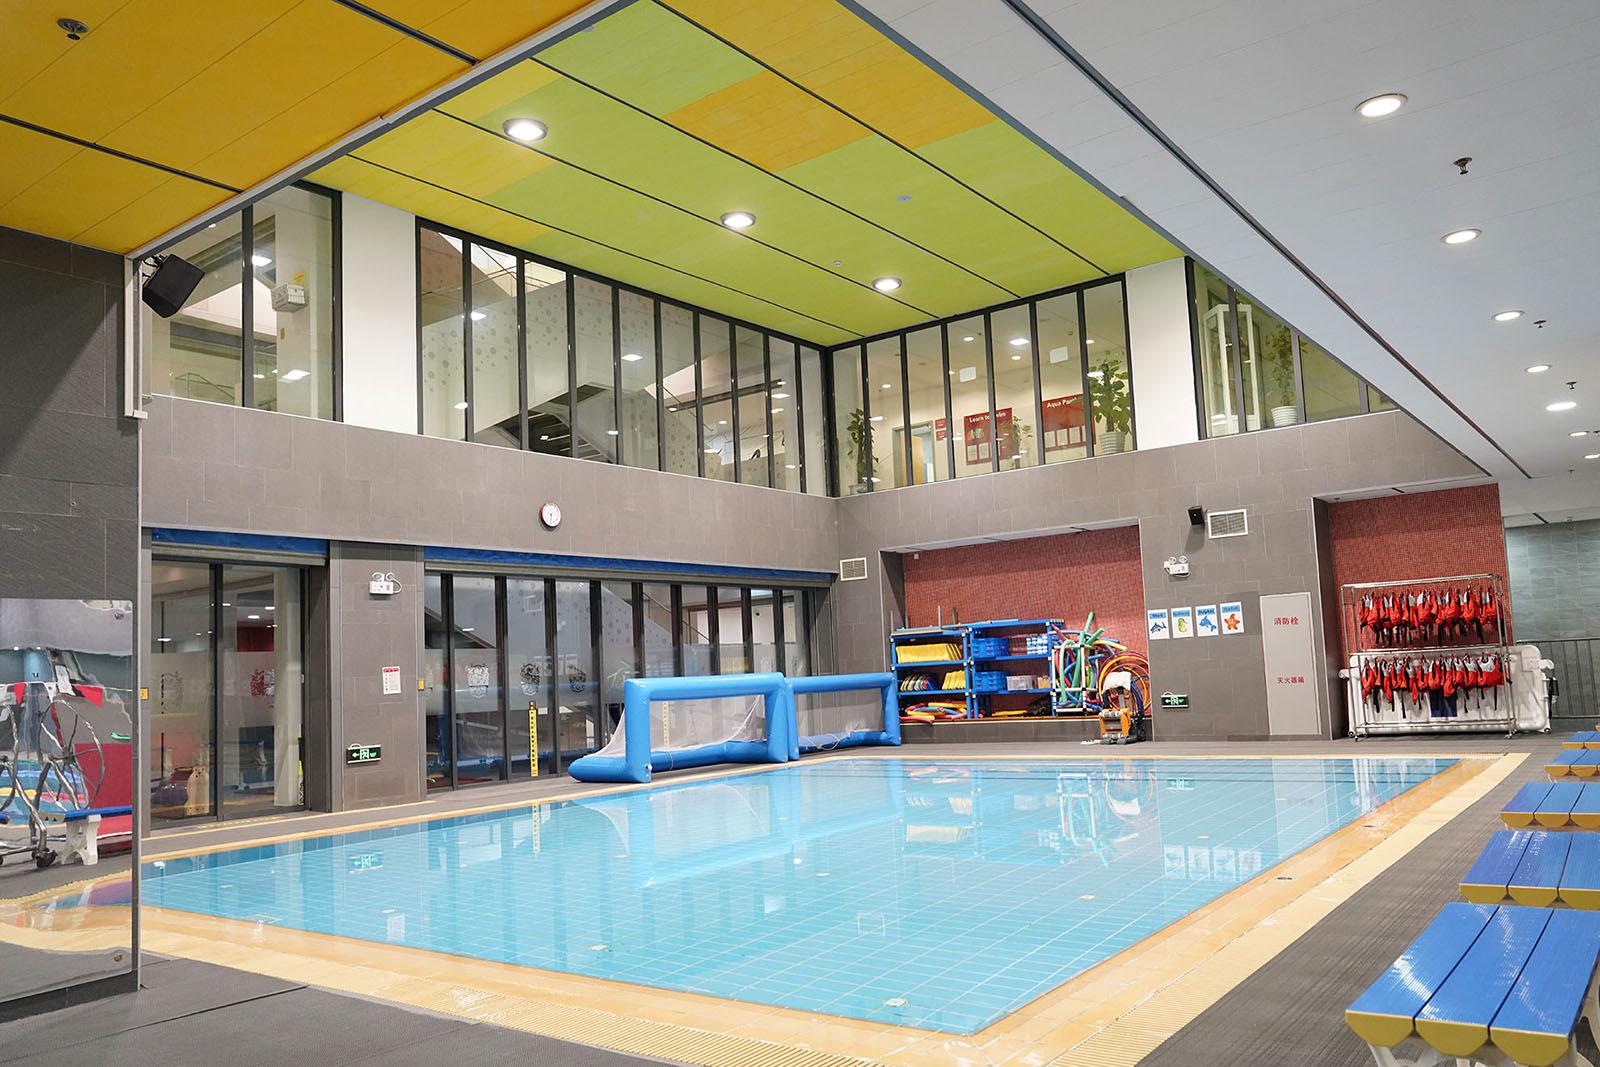 The learner pool